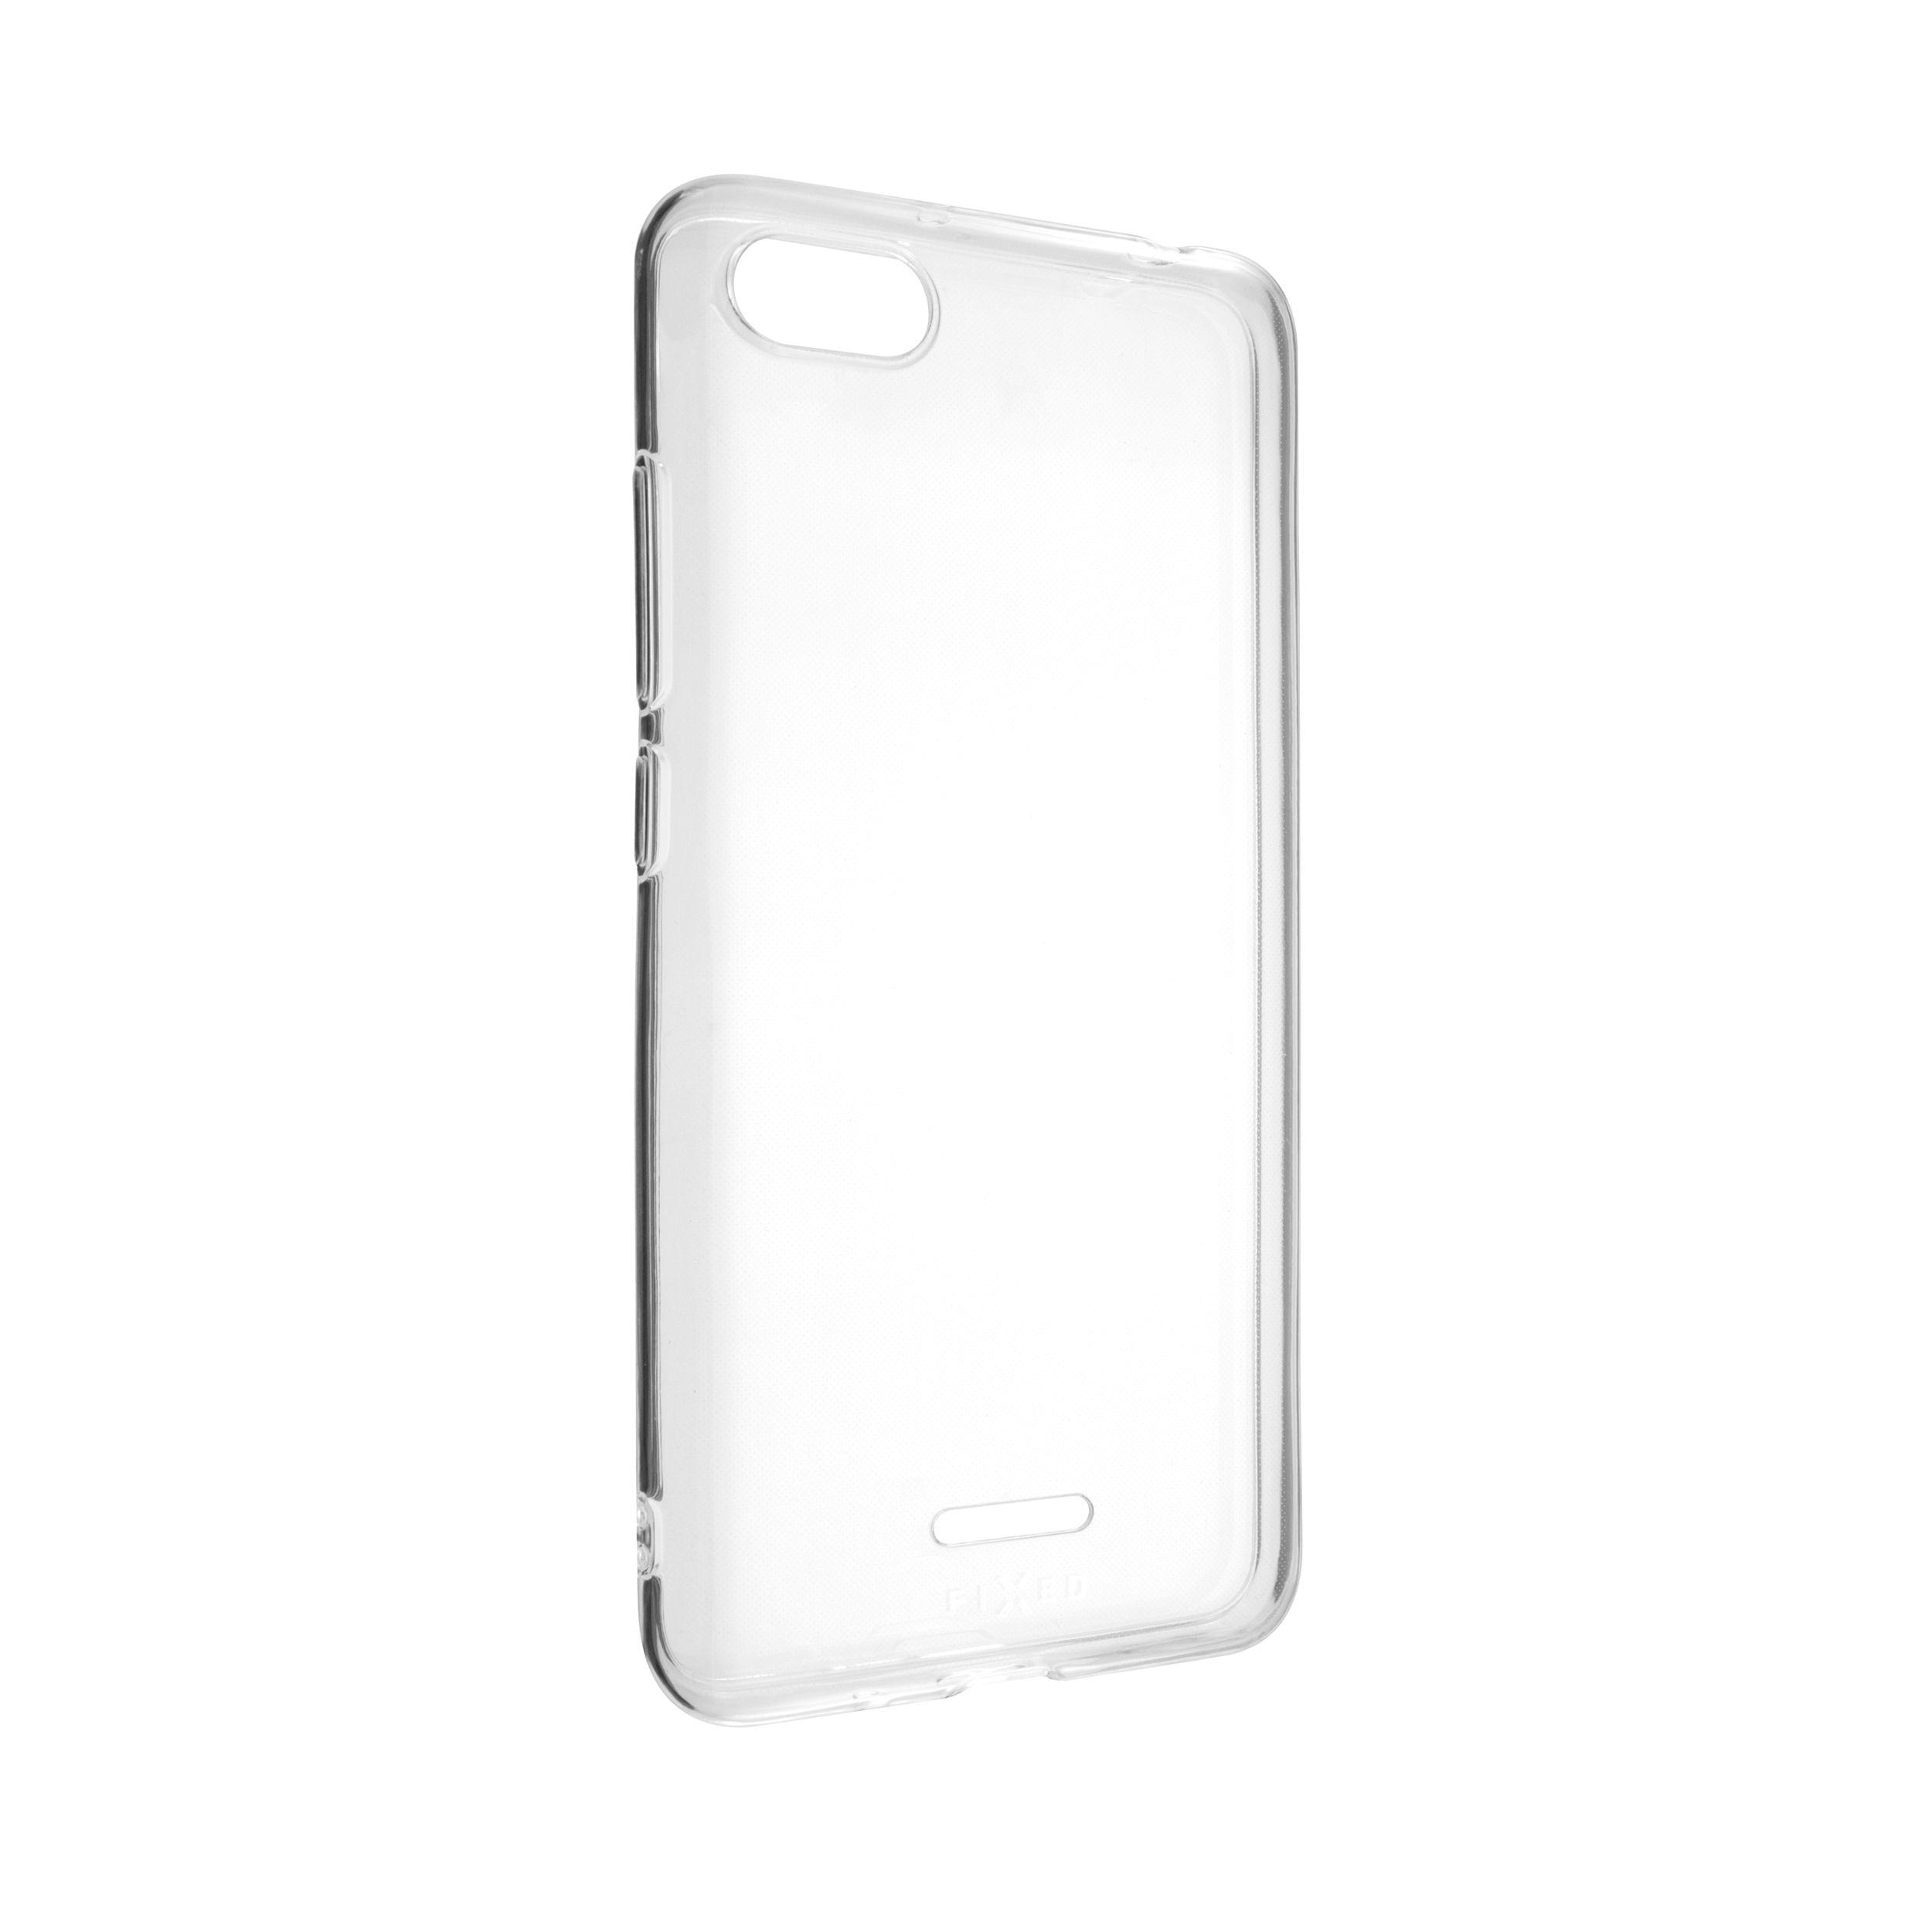 Ultratenké TPU gelové pouzdro FIXED Skin pro Xiaomi Redmi 6A, 0,6 mm, čiré